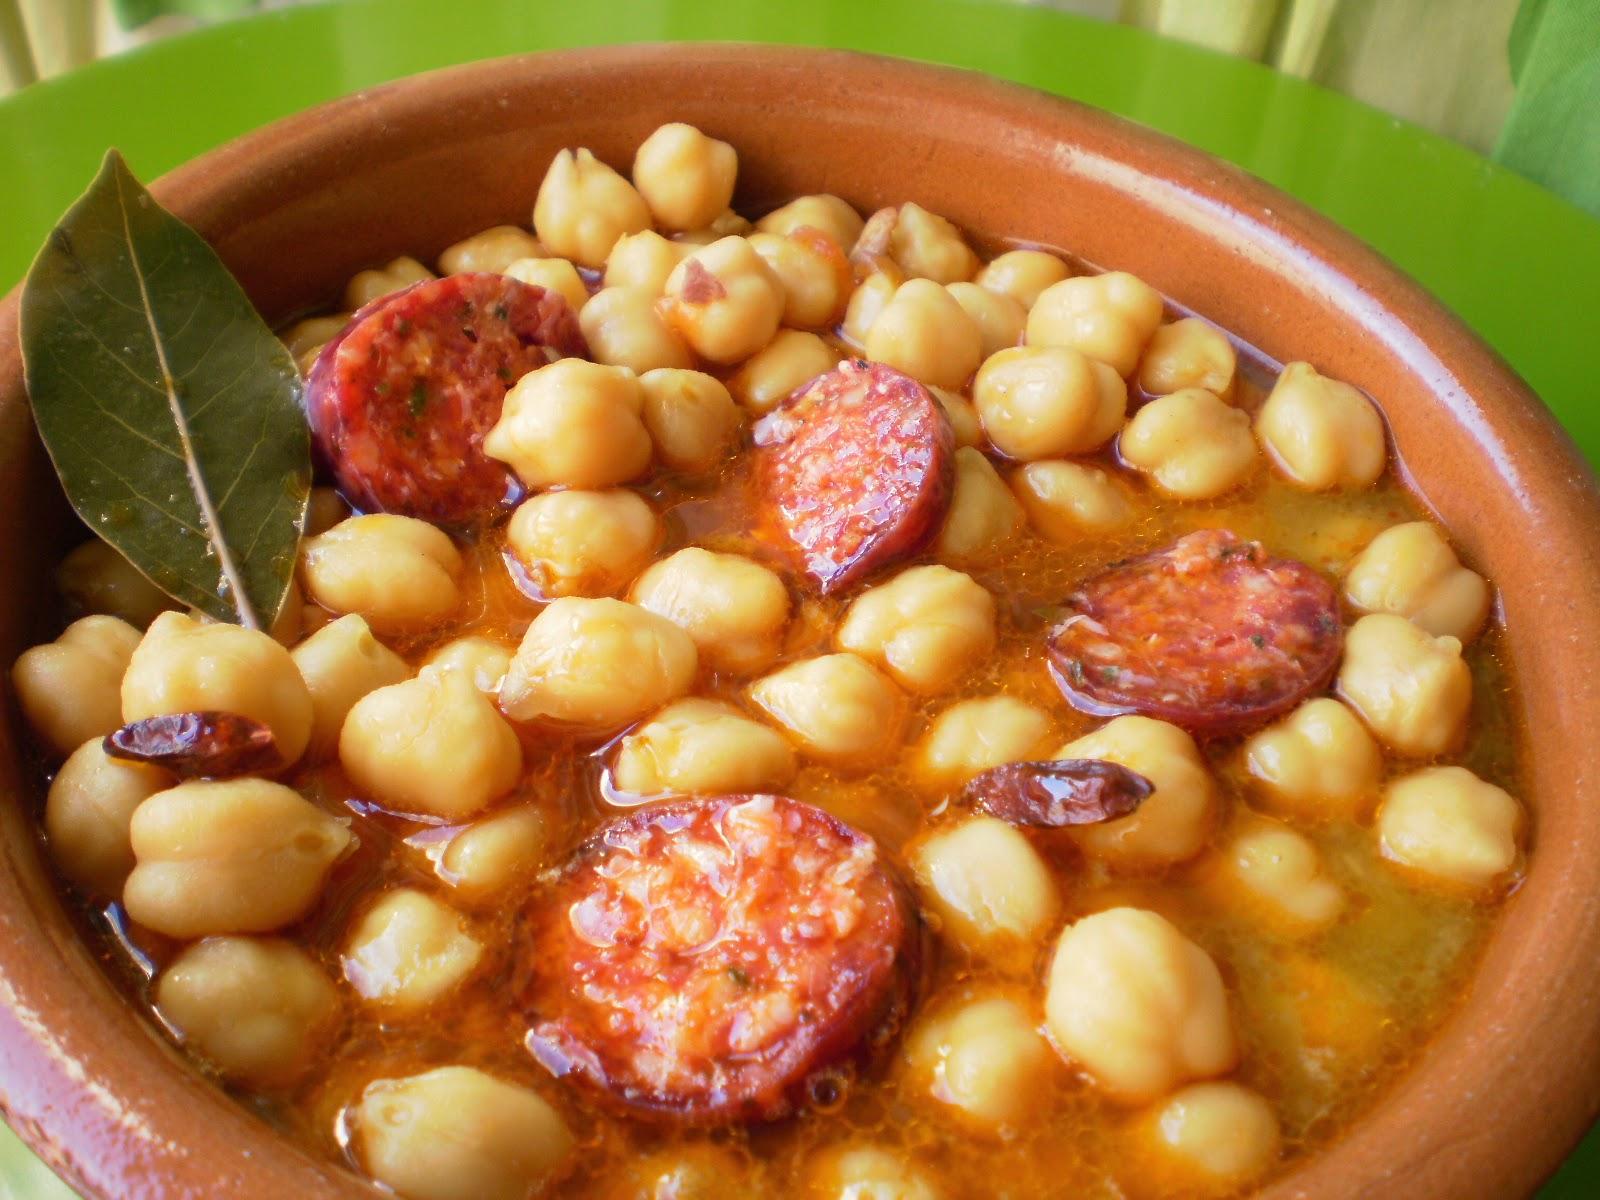 Mi cocina potaje de garbanzos con chorizo - Potaje de garbanzos y judias ...